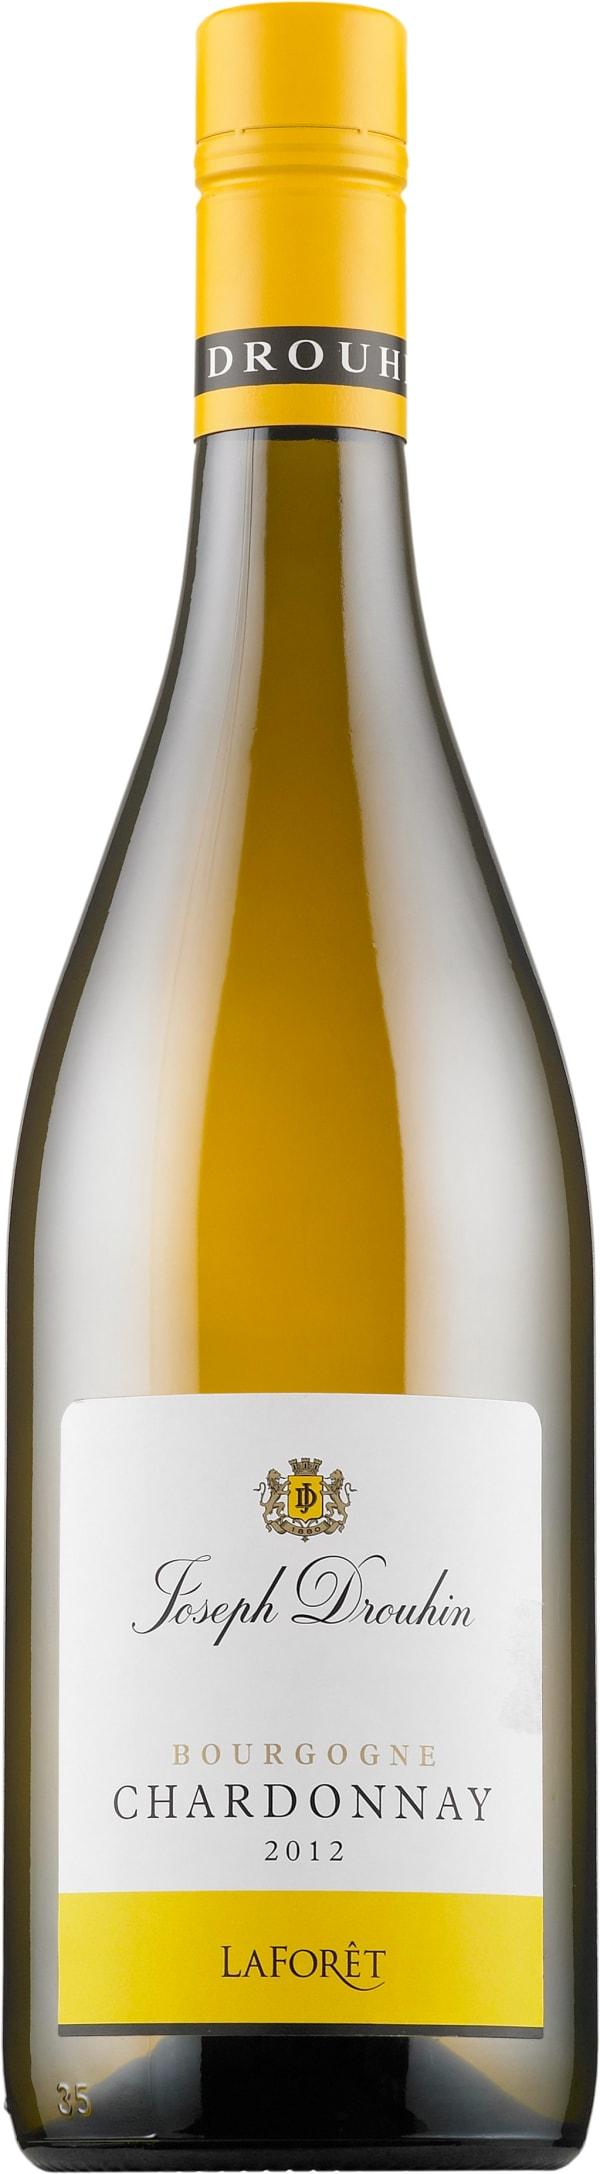 Joseph Drouhin Laforêt Chardonnay 2017